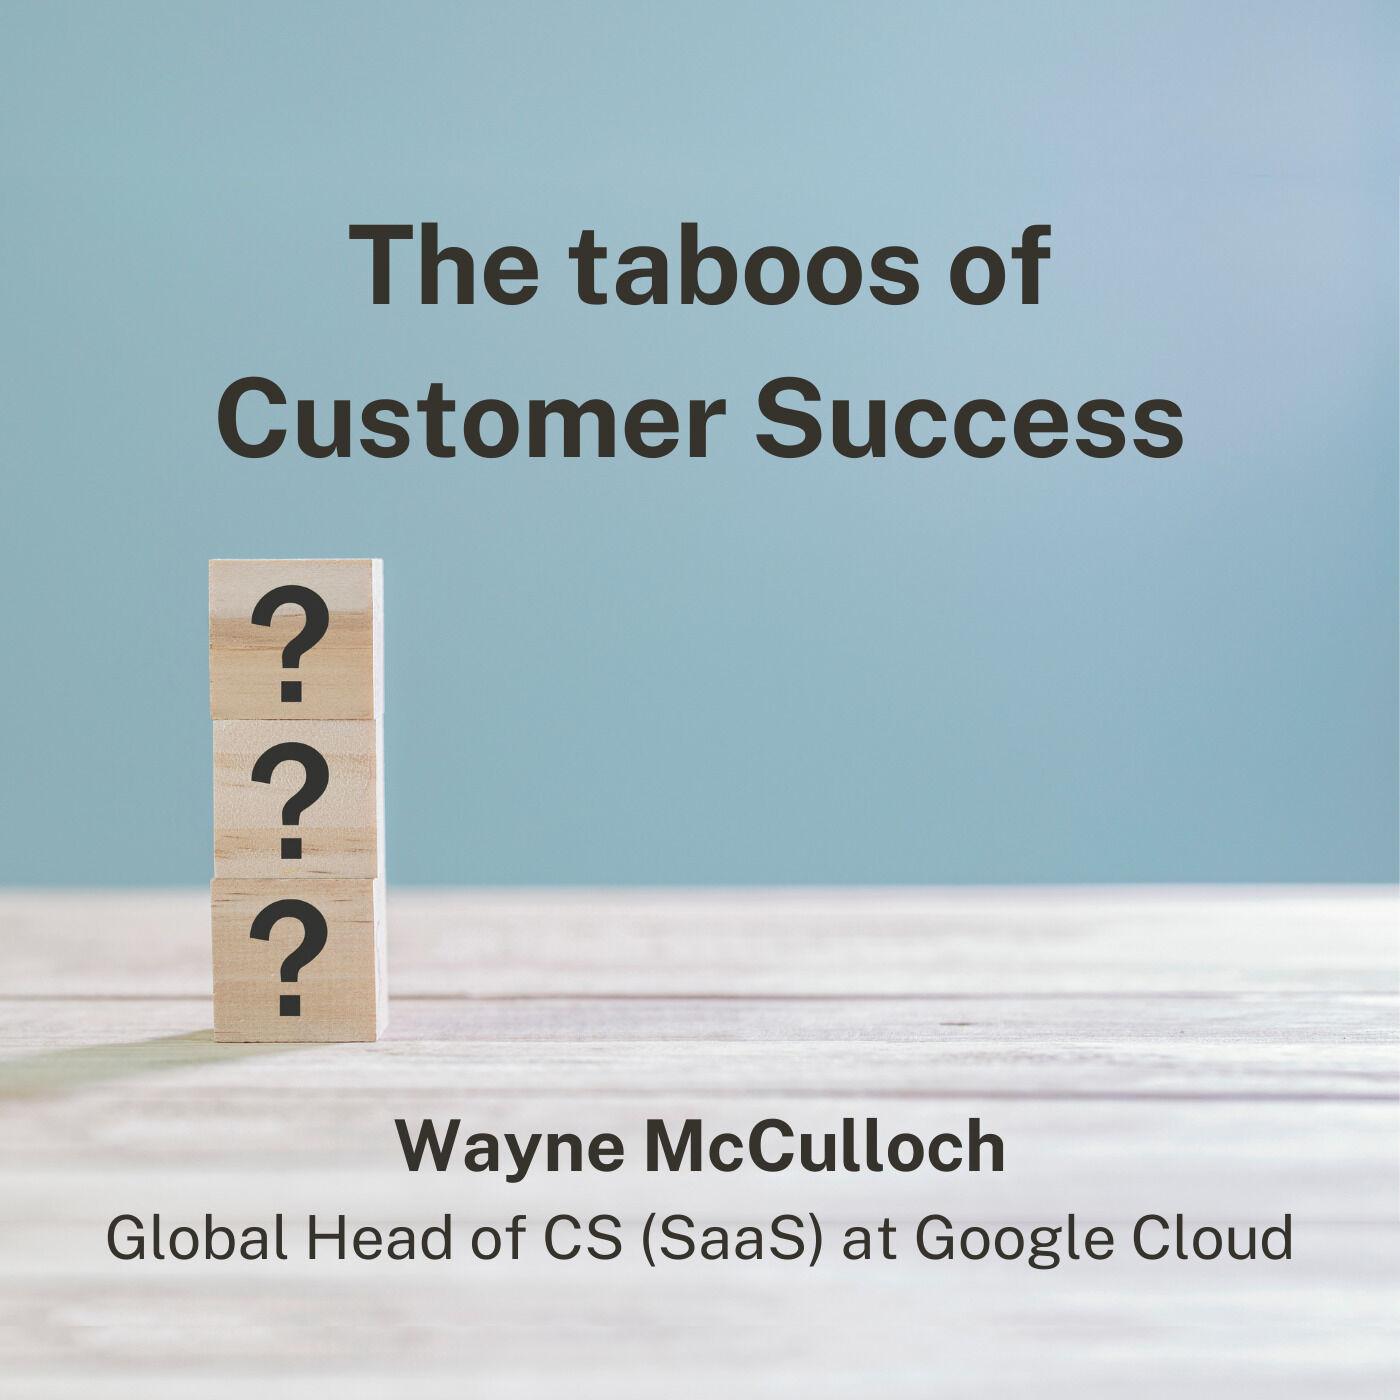 Wayne McCulloch, Global Head of CS (SaaS) at Google Cloud - the taboos of Customer Success